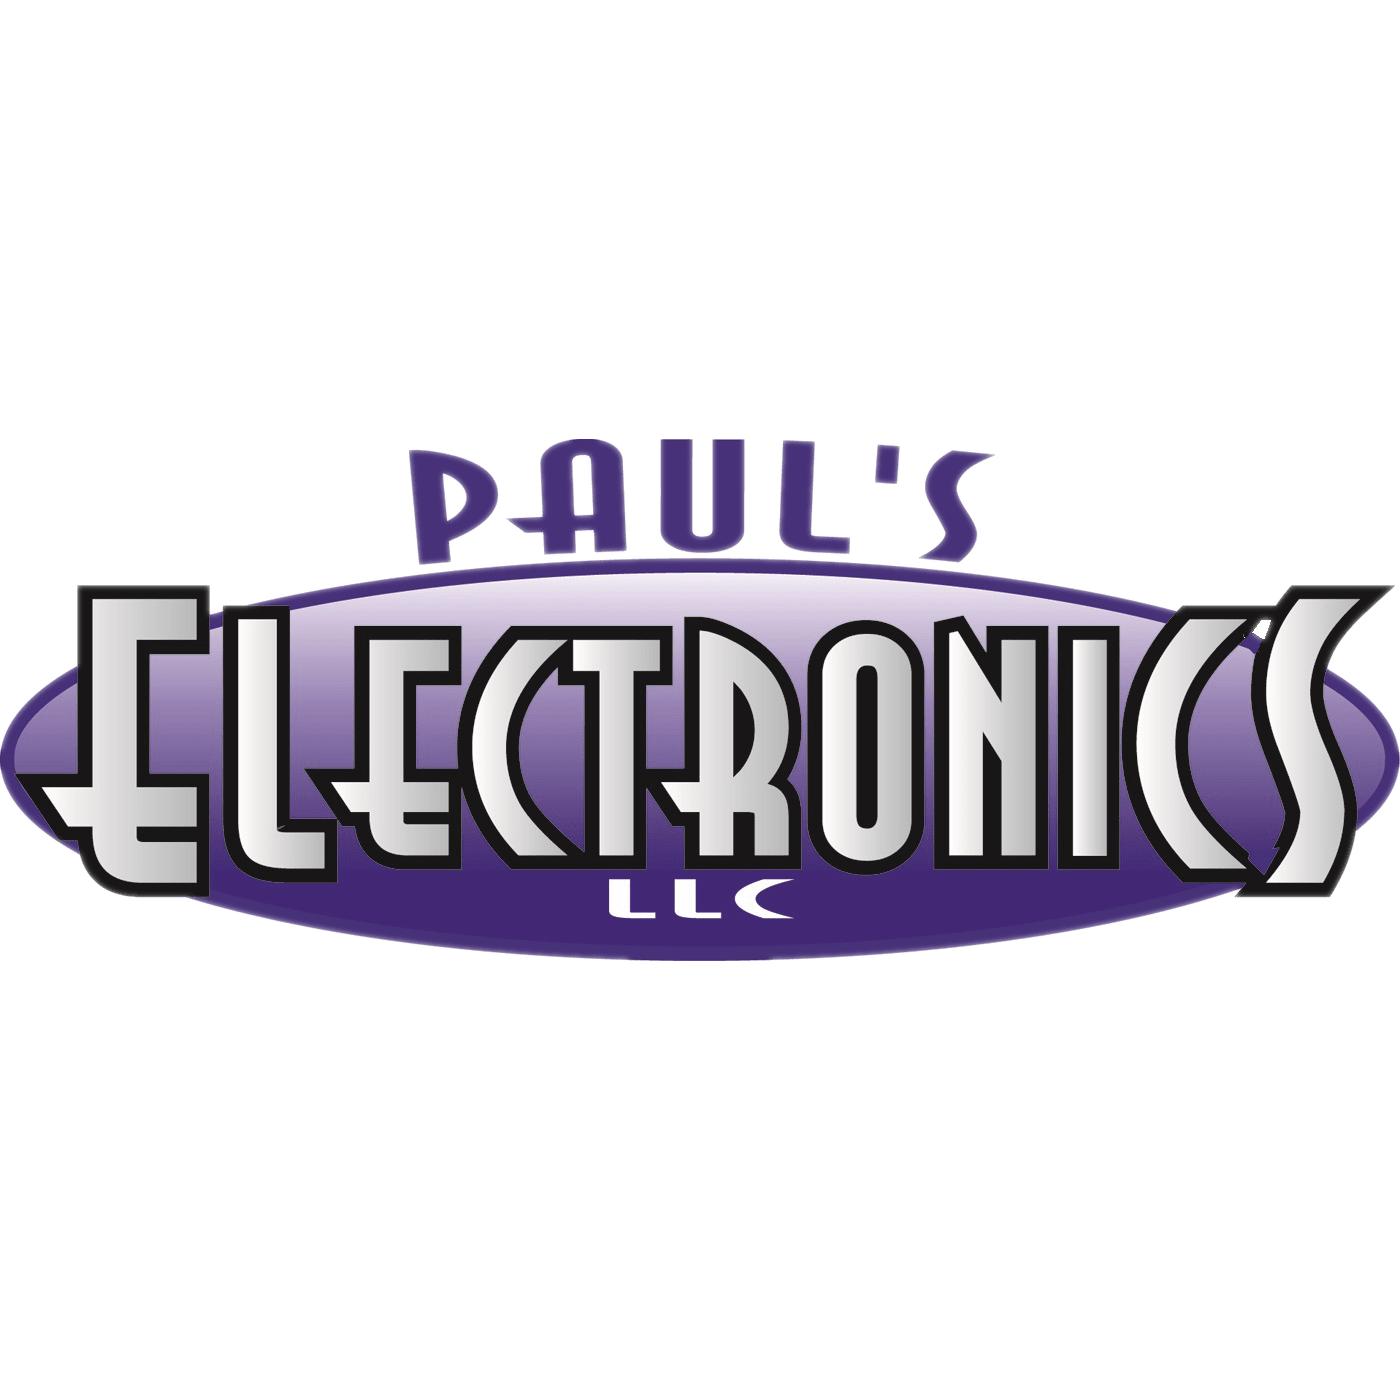 Paul's Electronics